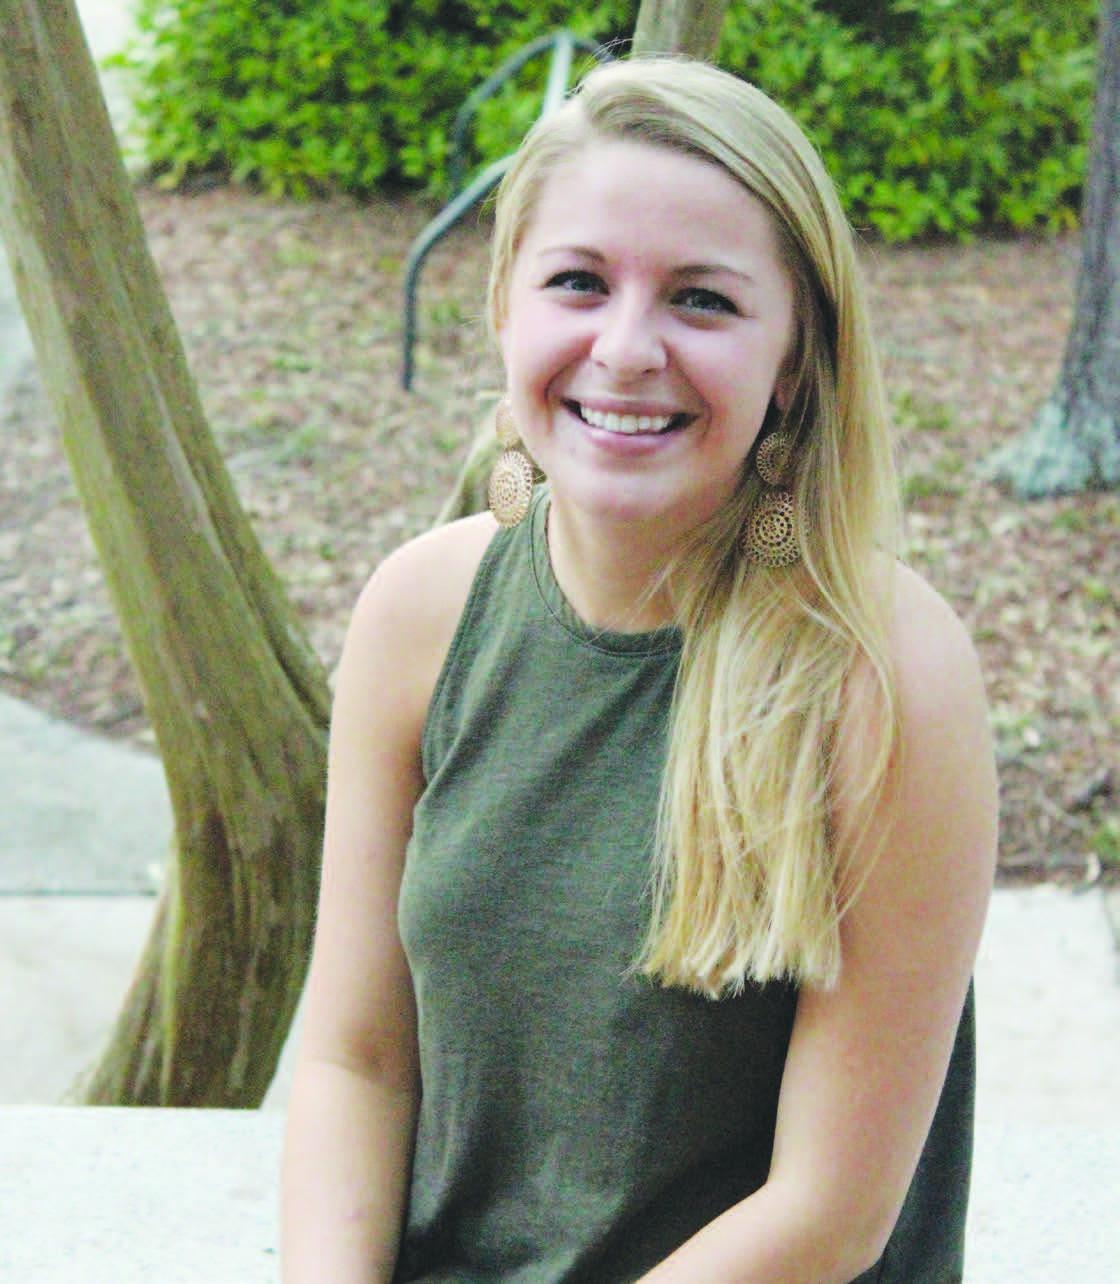 Junior nursing student Grayson Hucks returns to campus and anticipates resuming classes once her brain injury heals.